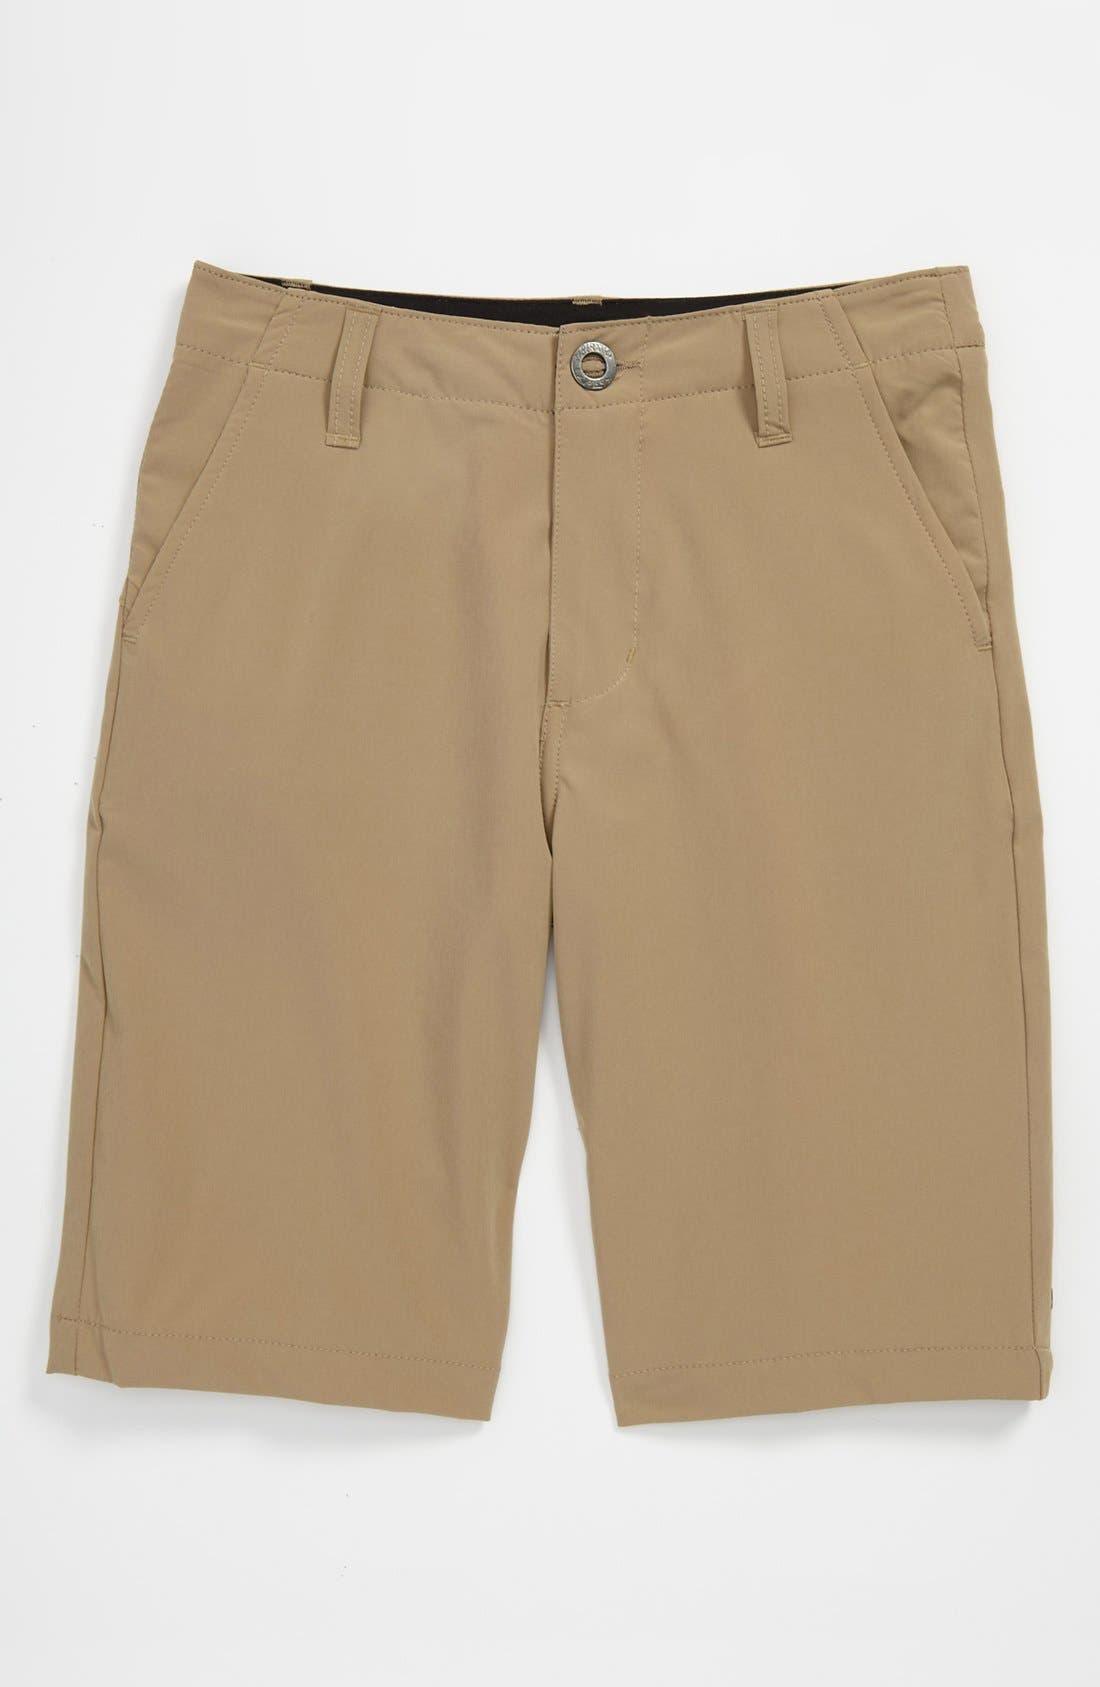 Alternate Image 1 Selected - Volcom Hybrid Shorts (Big Boys)